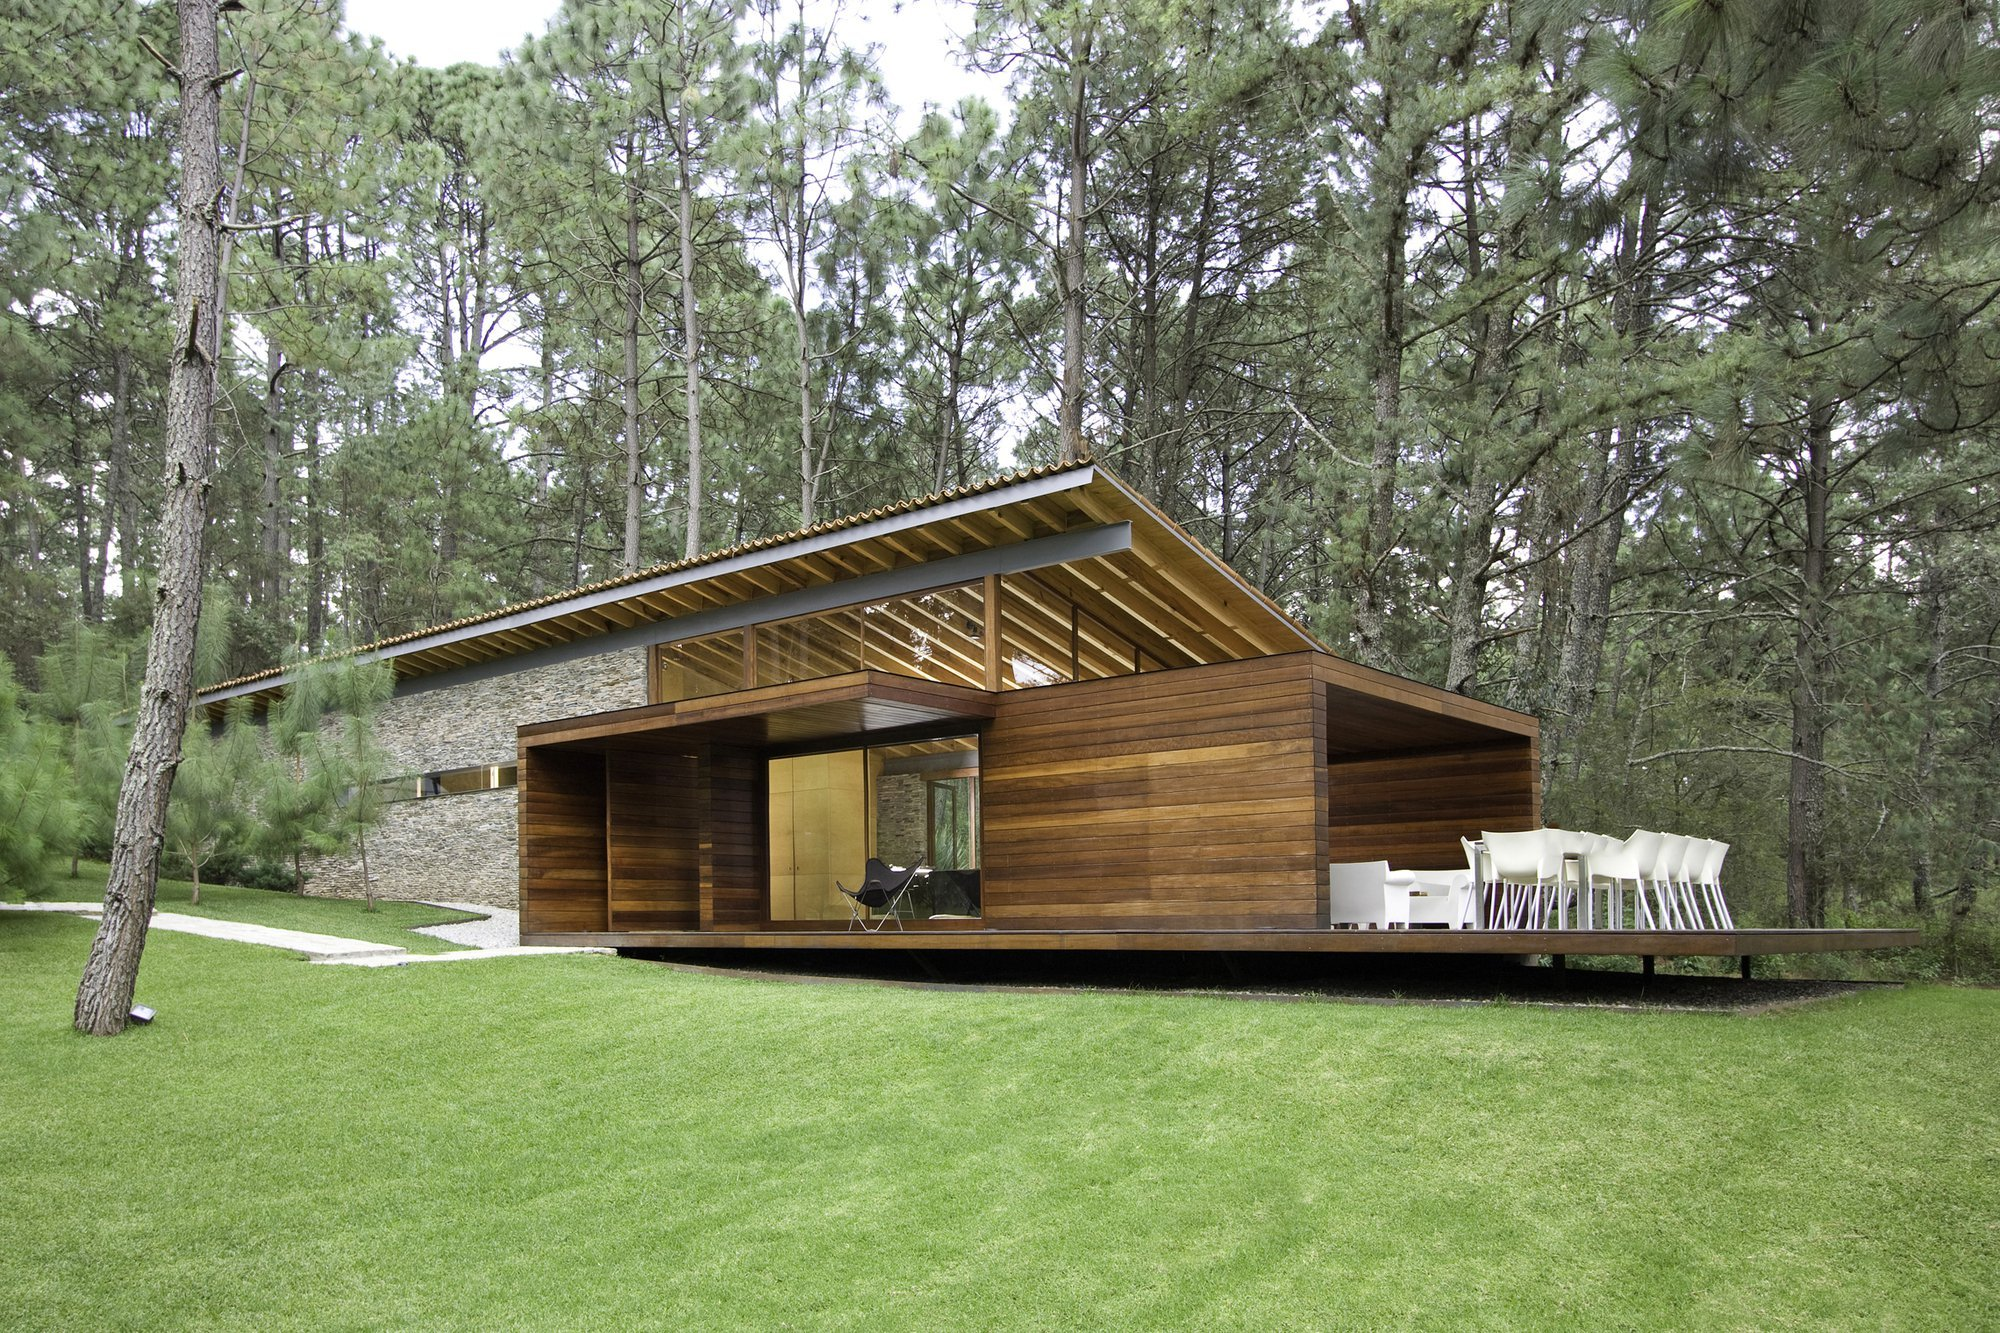 Galer a de casa ro tapalpa el as rizo arquitectos 2 for Casa de arquitectos